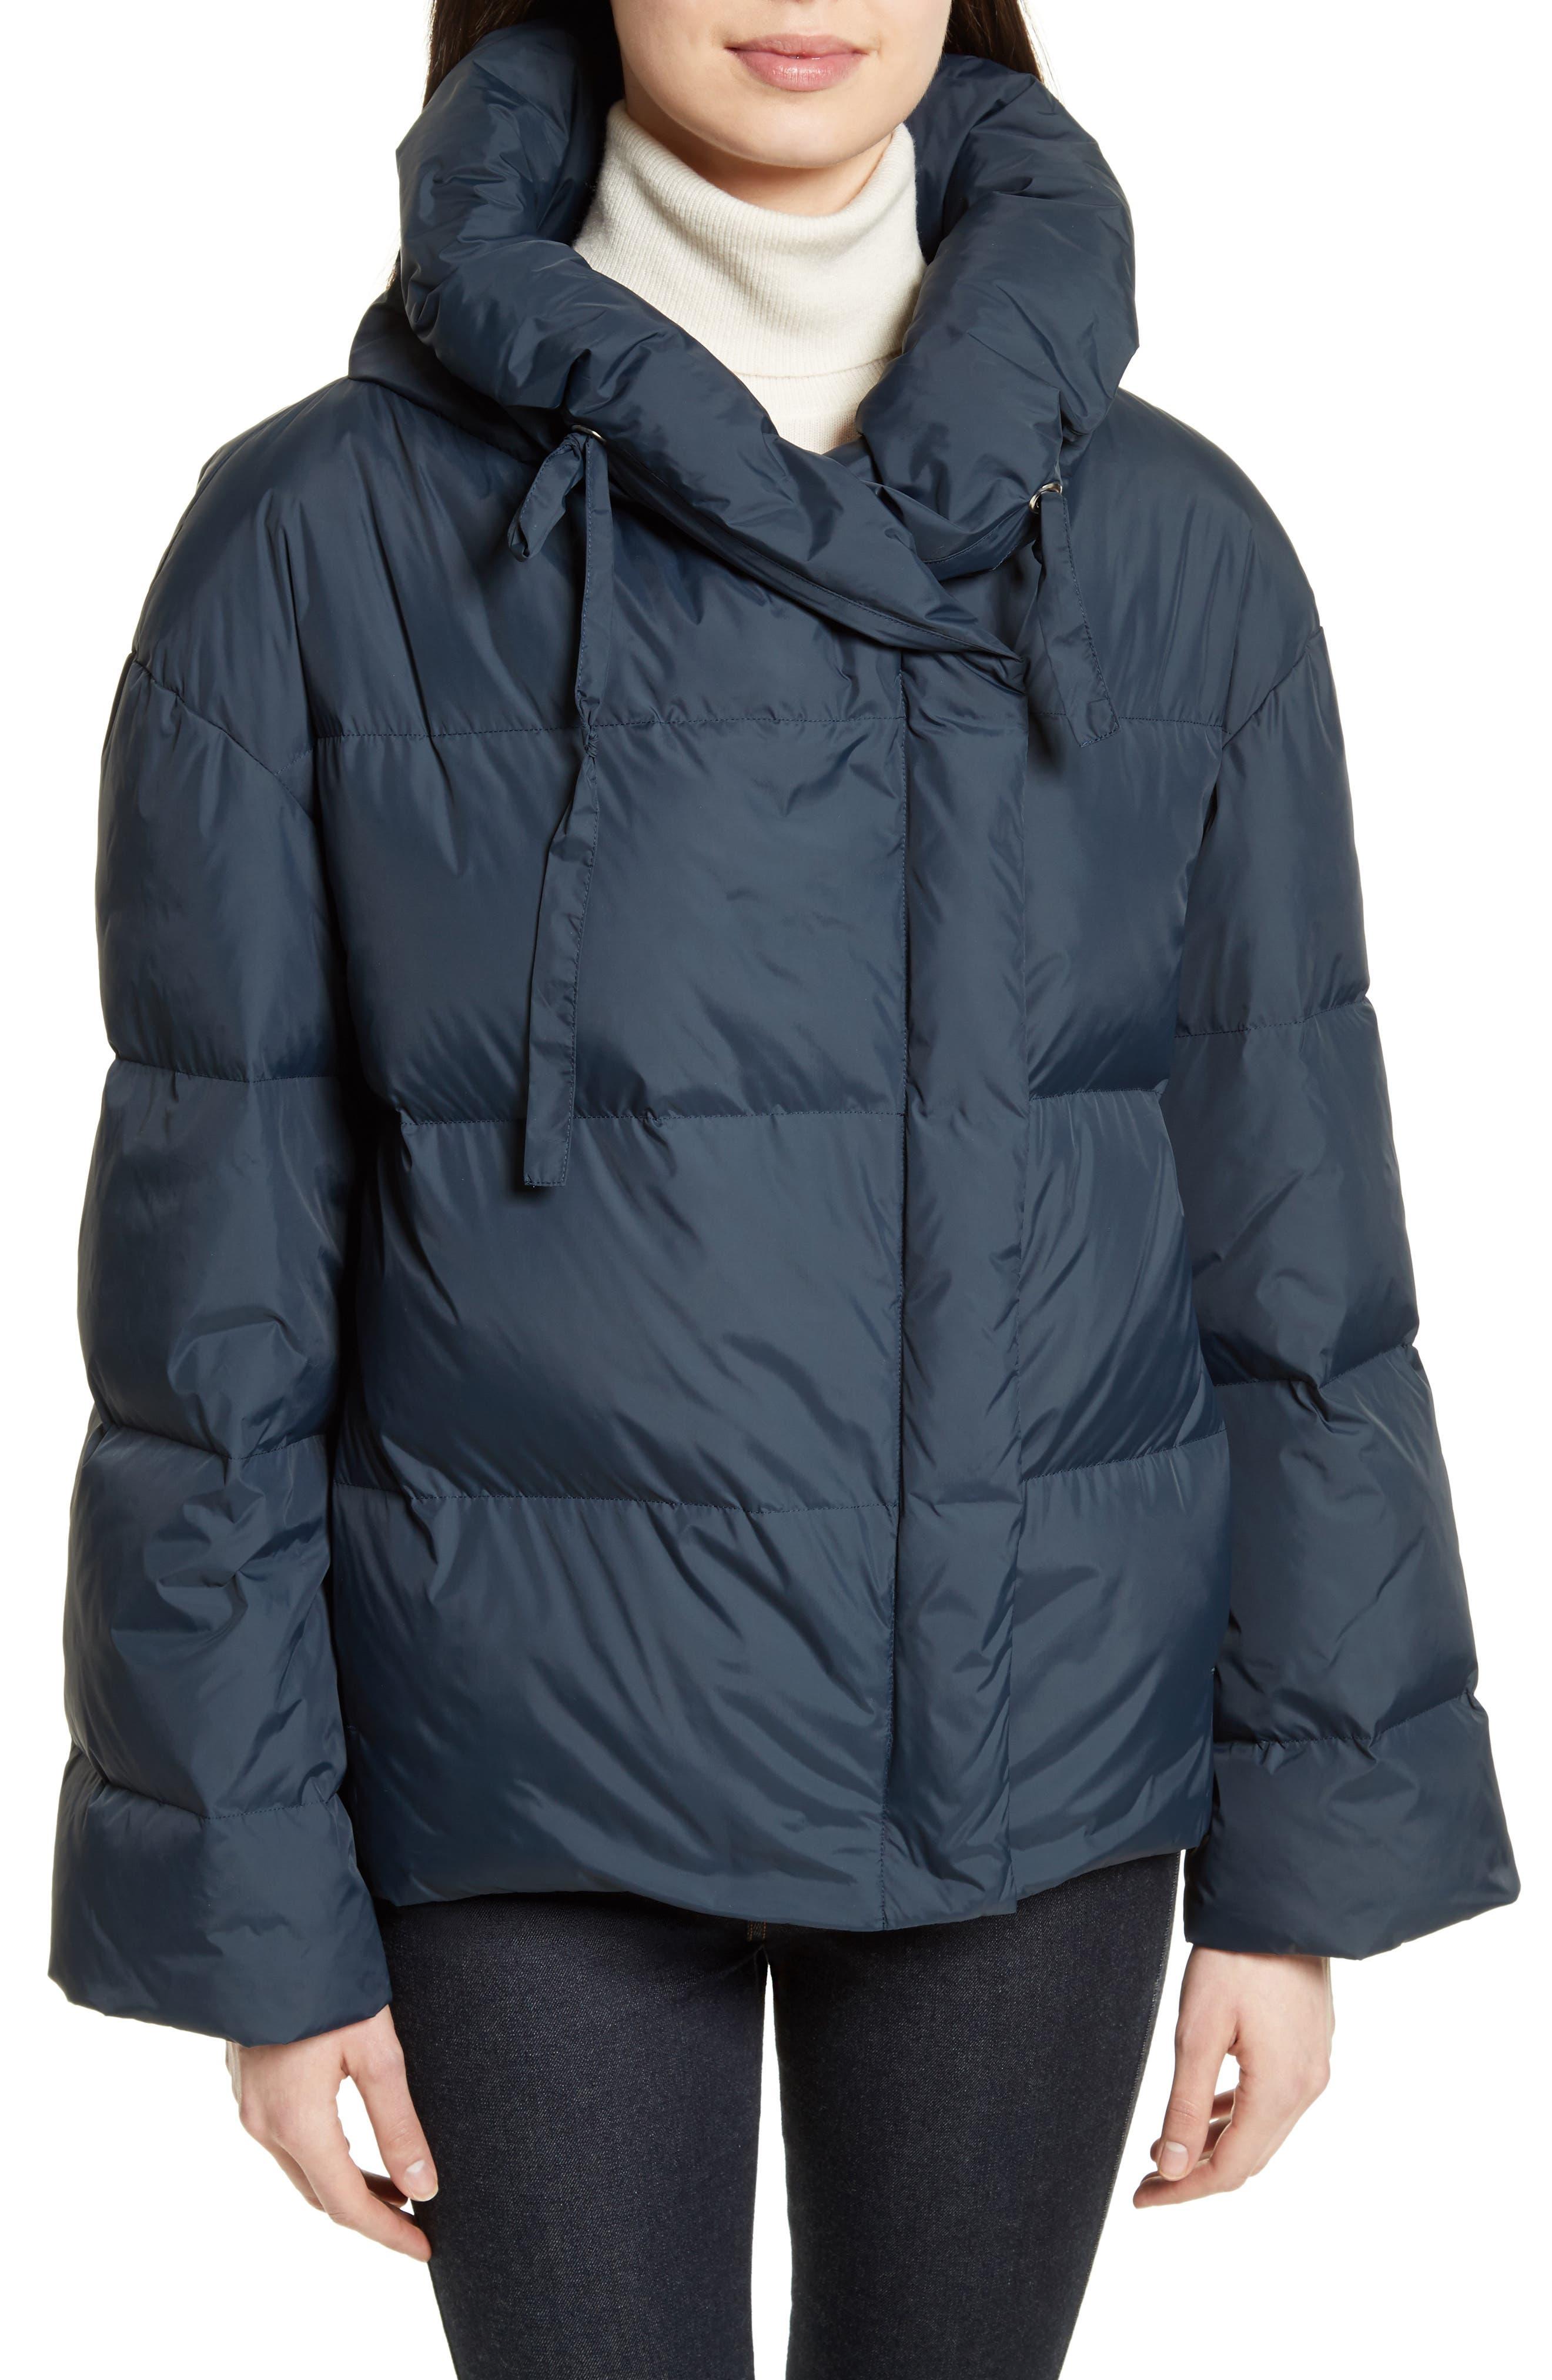 Toralla Puffer Jacket,                         Main,                         color, 411